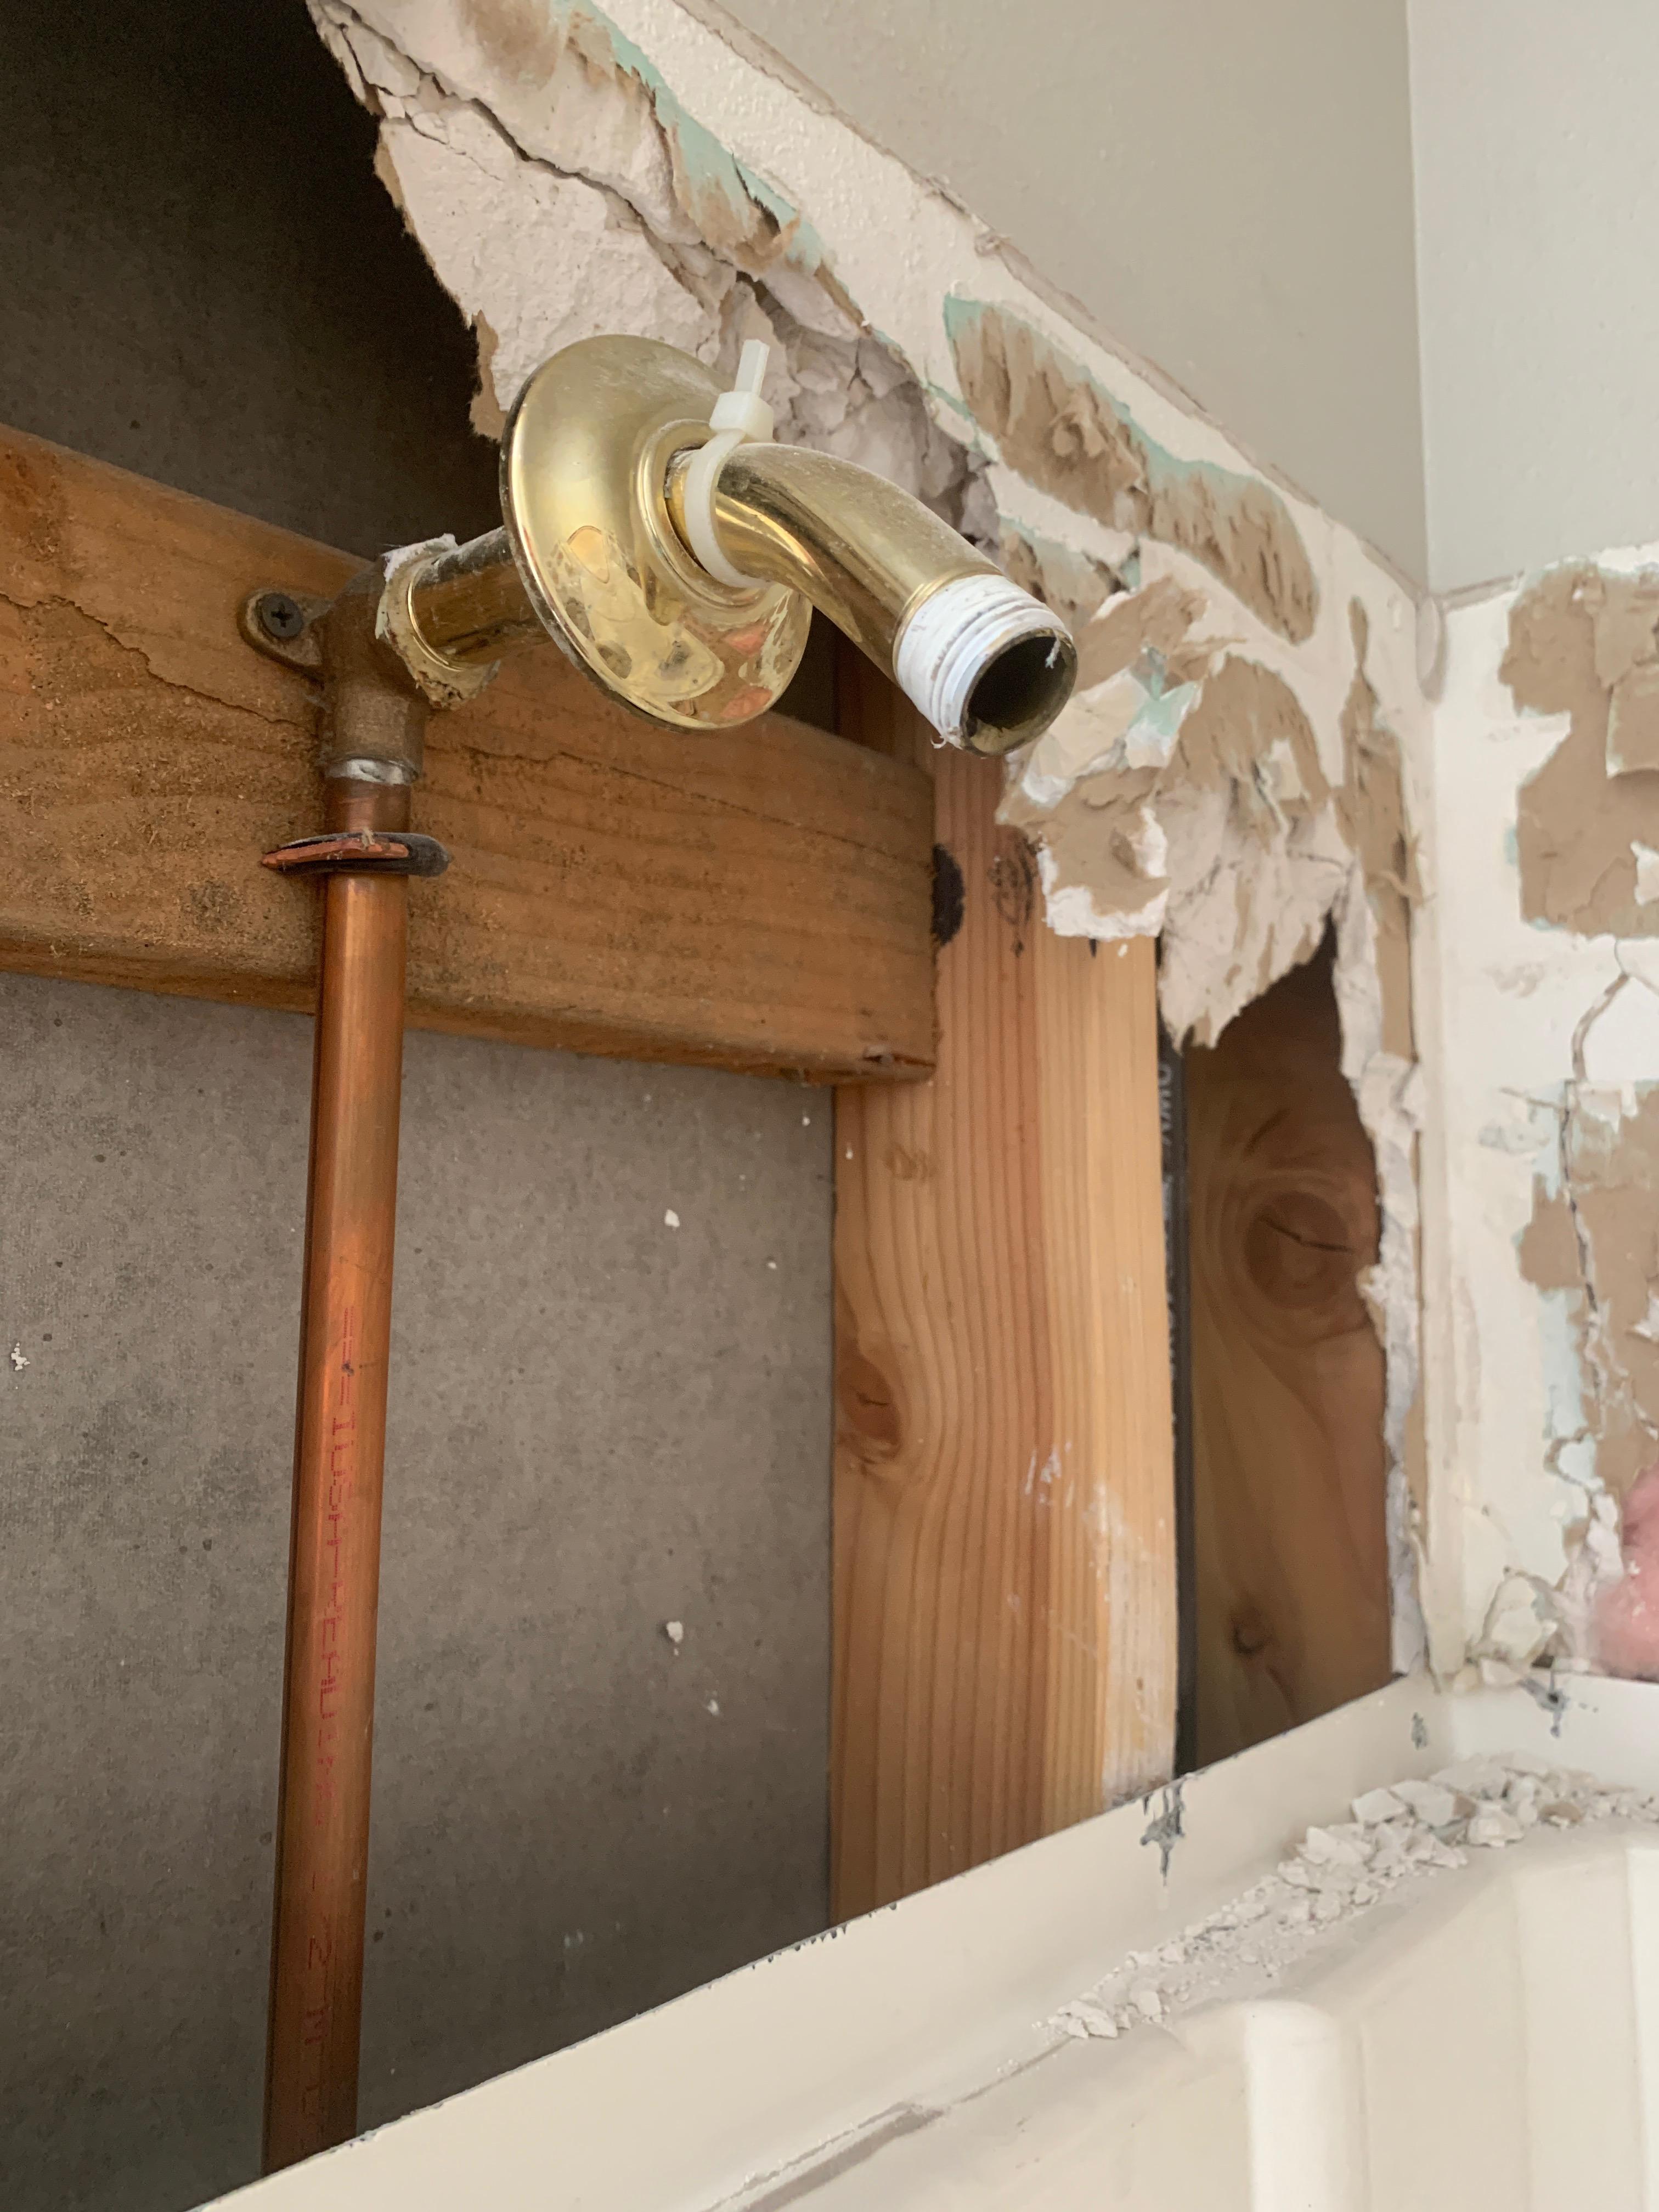 Found a shower pipe!